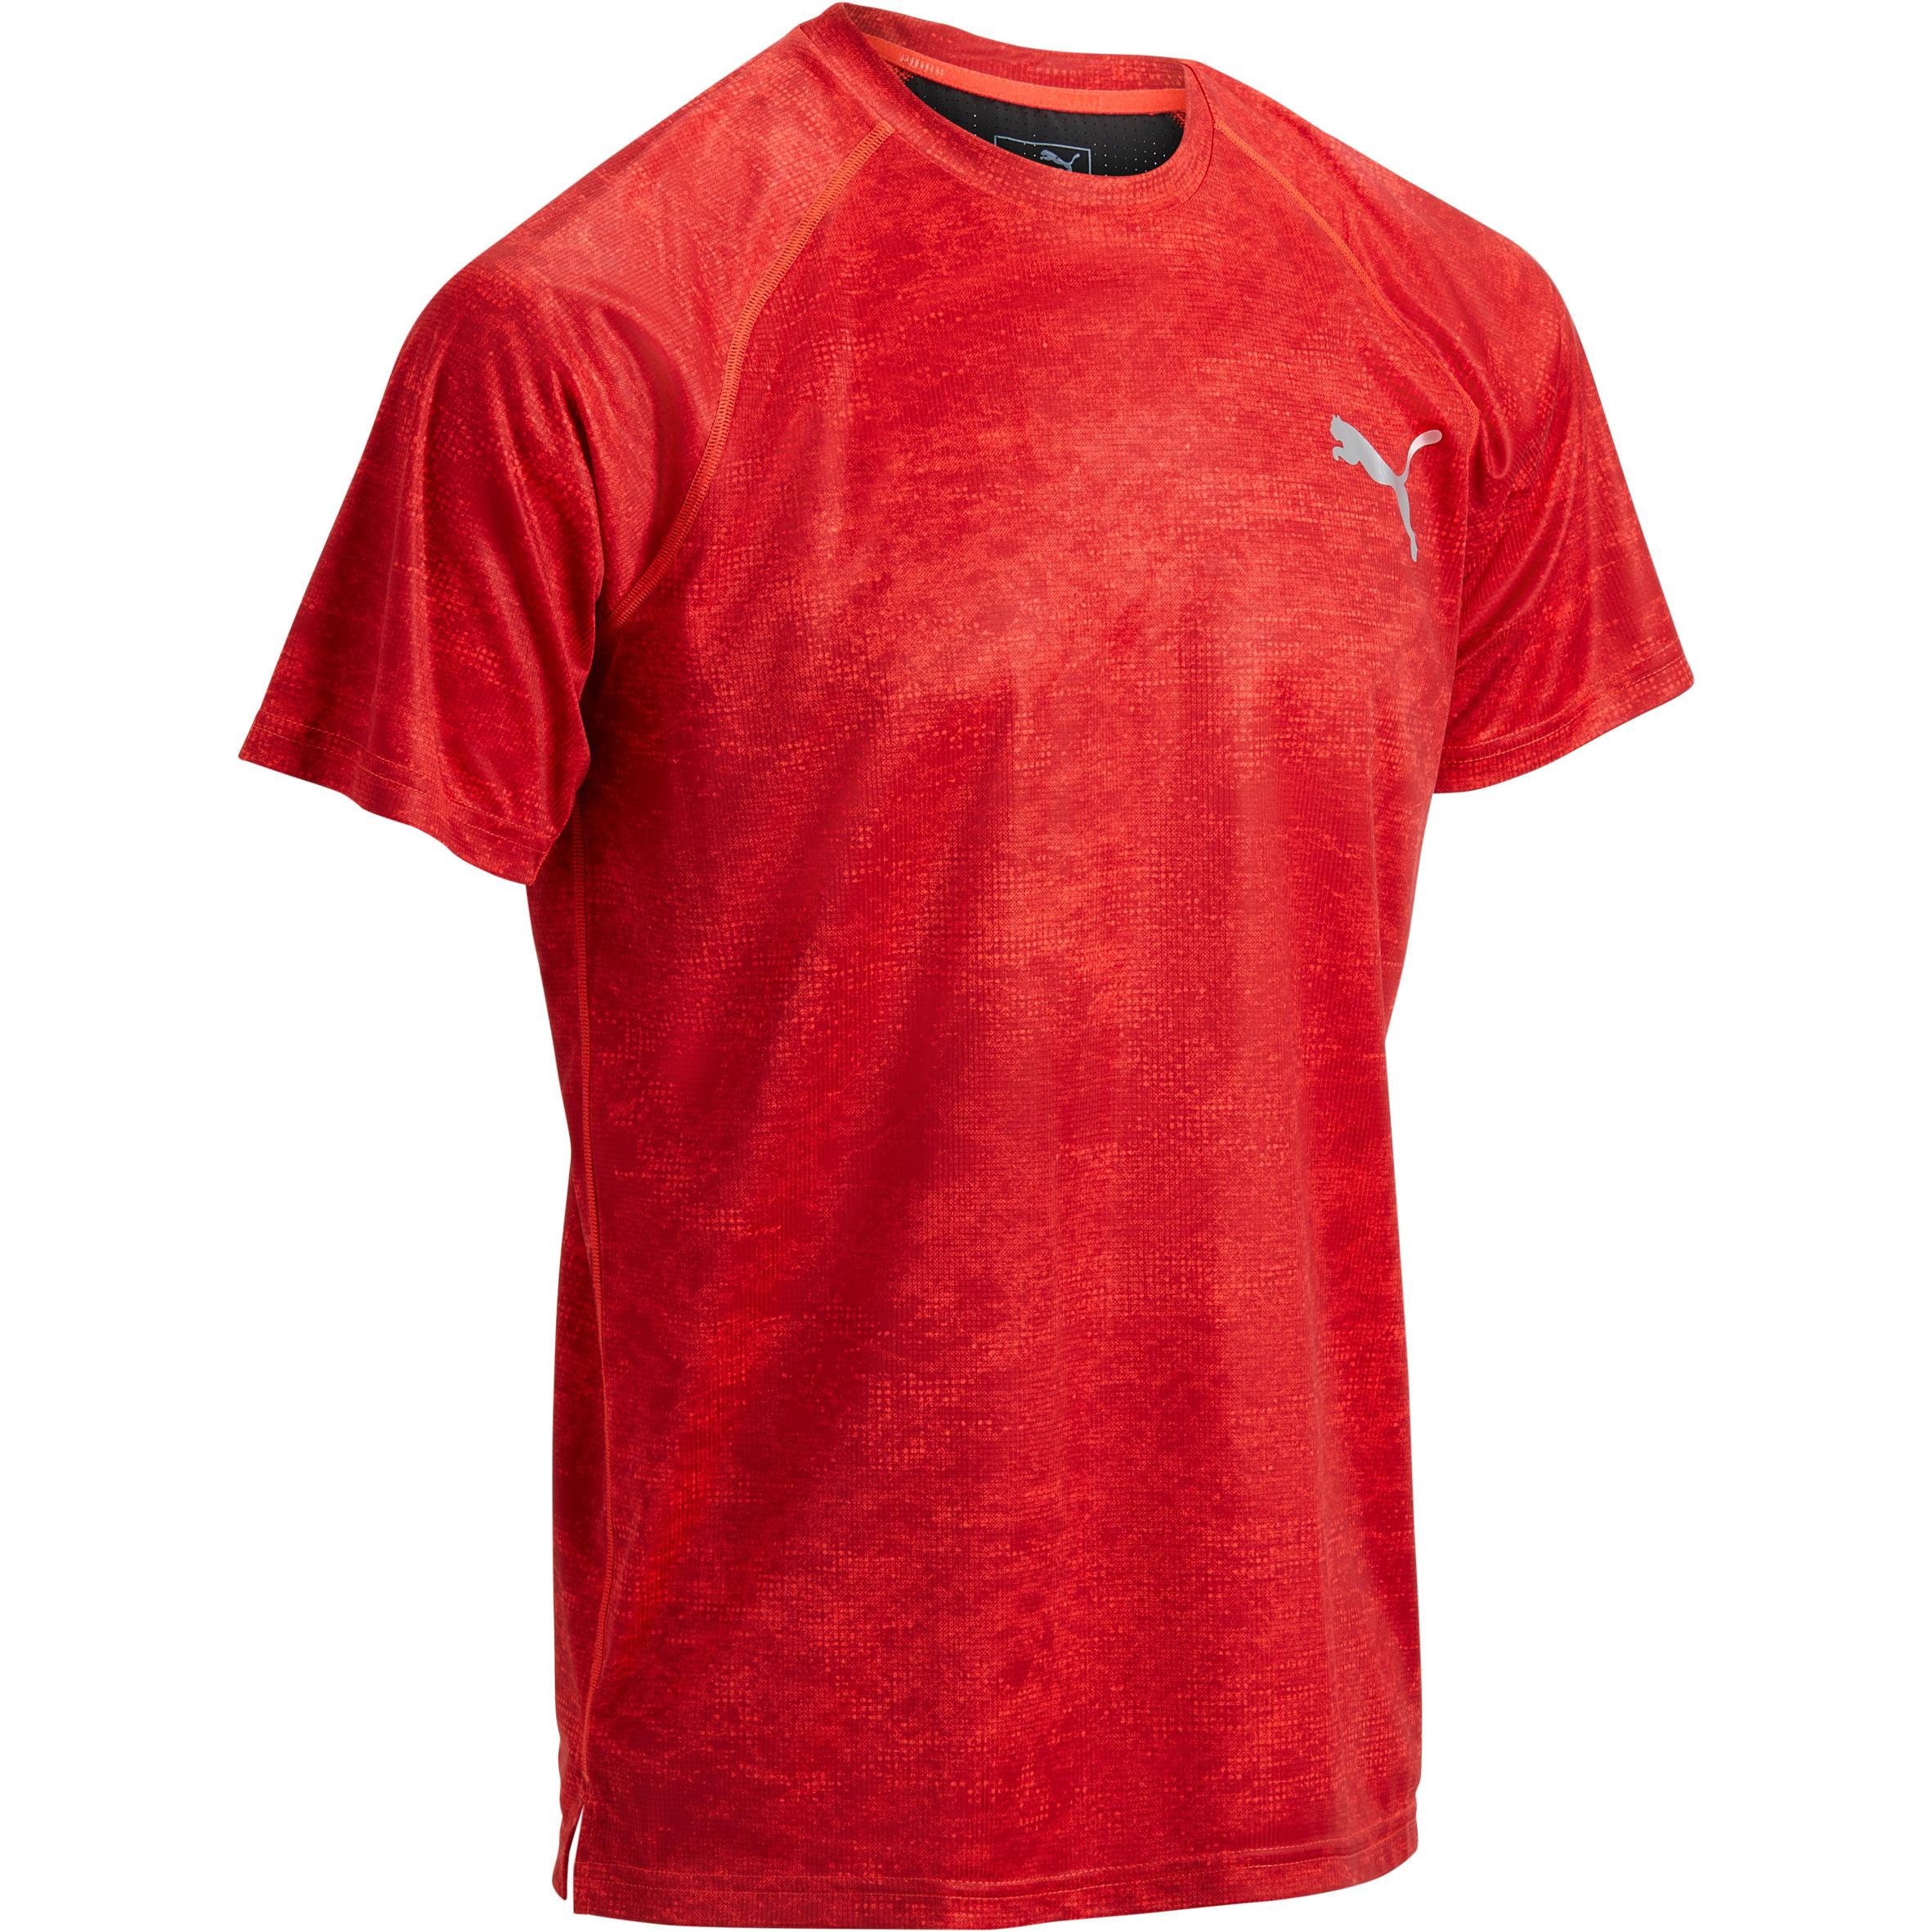 Puma T-shirt Puma rood AOP